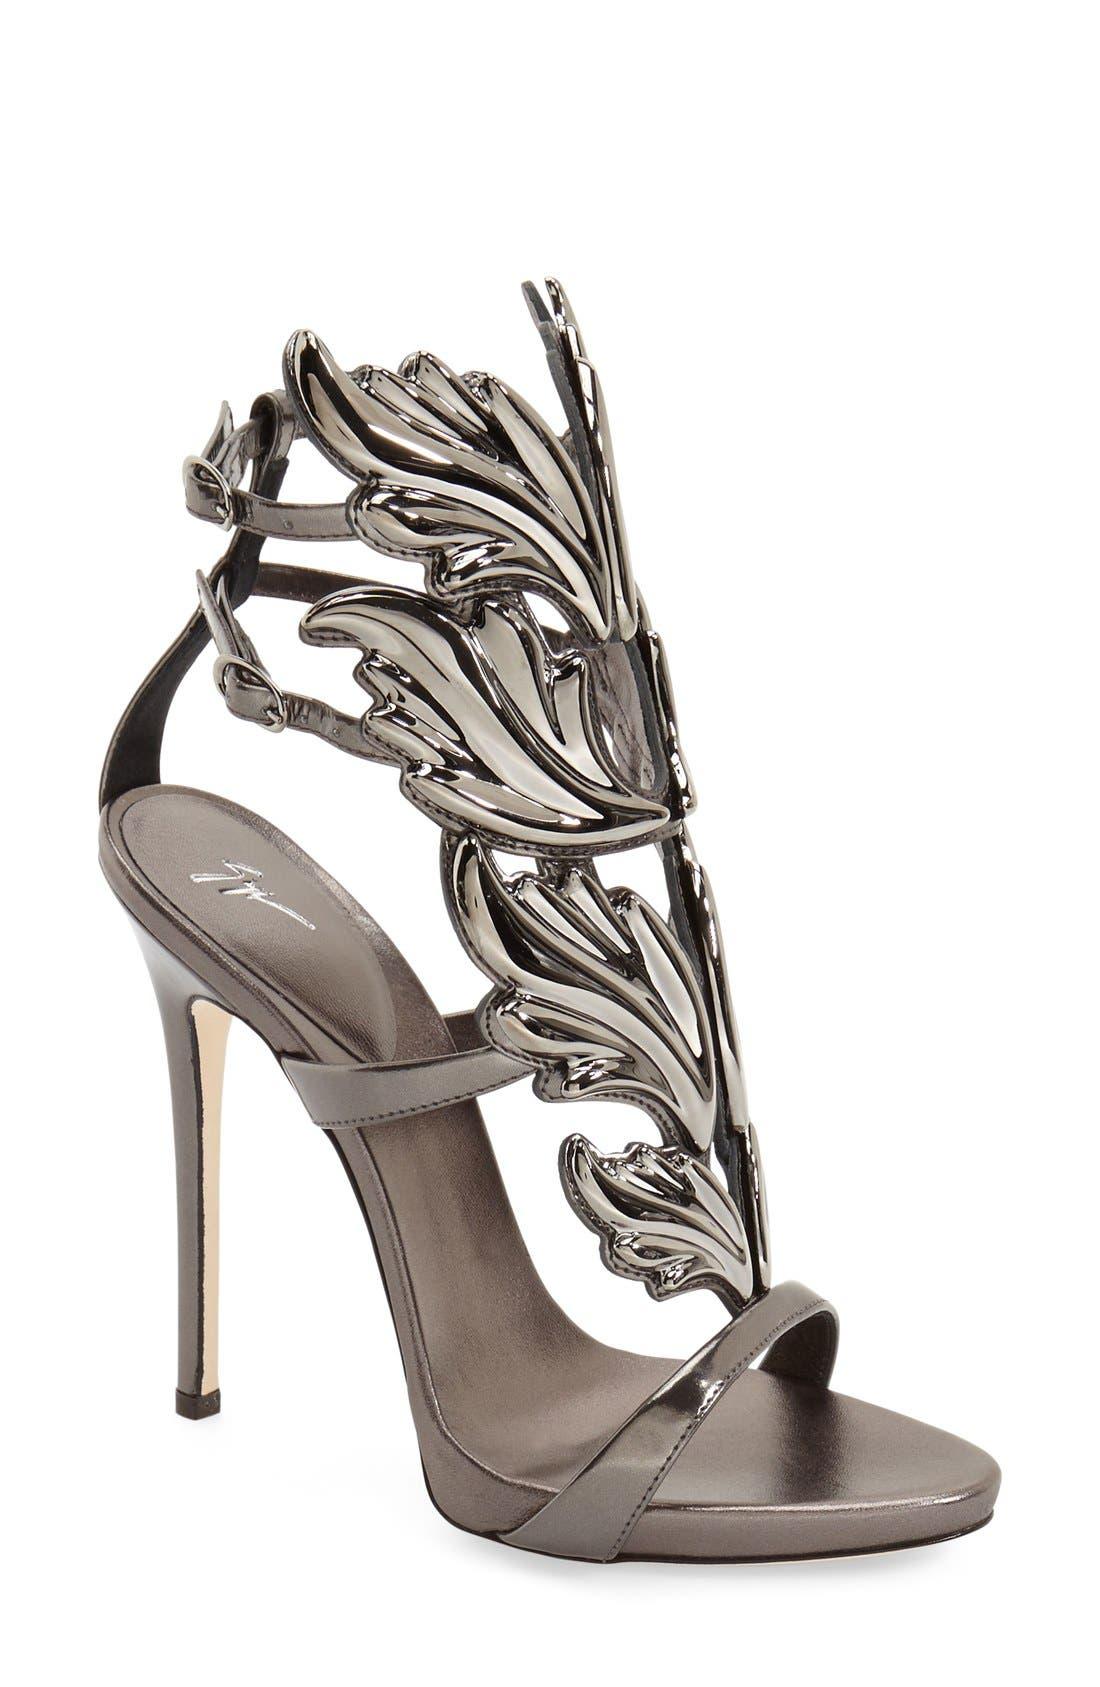 Alternate Image 1 Selected - Giuseppe Zanotti 'Cruel' Wing Sandal (Women) (Nordstrom Exclusive)